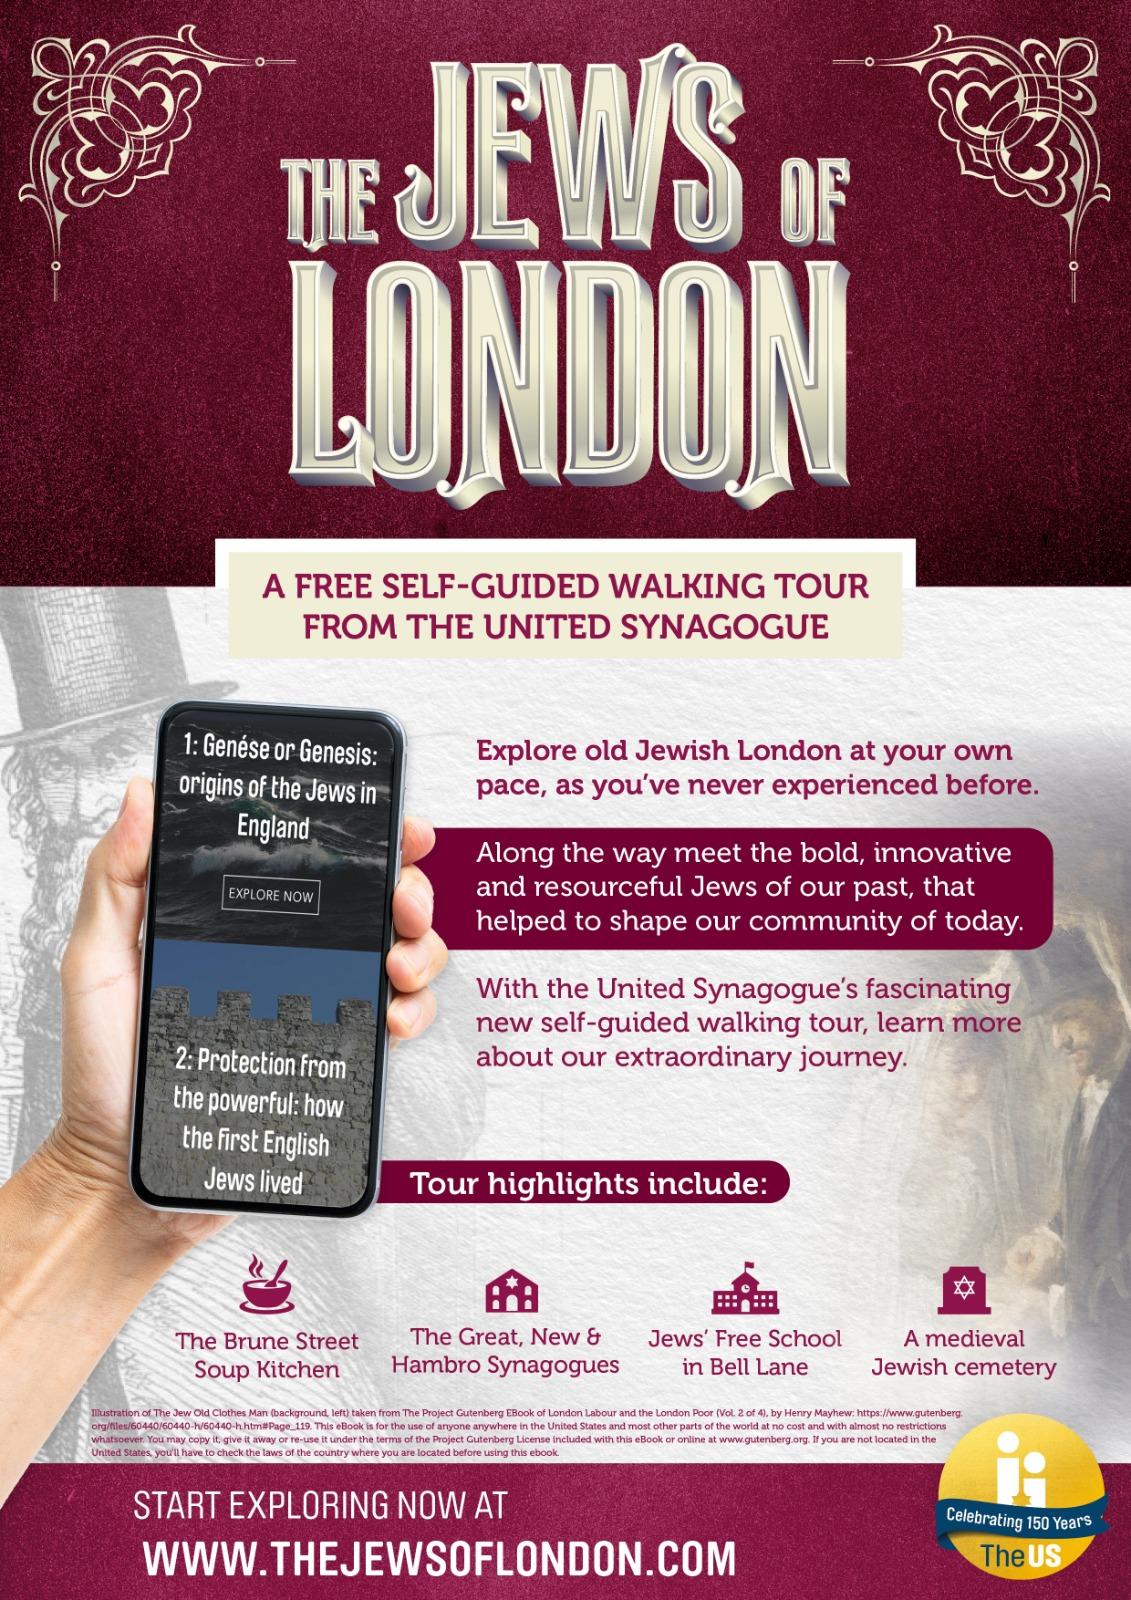 The Jews of London